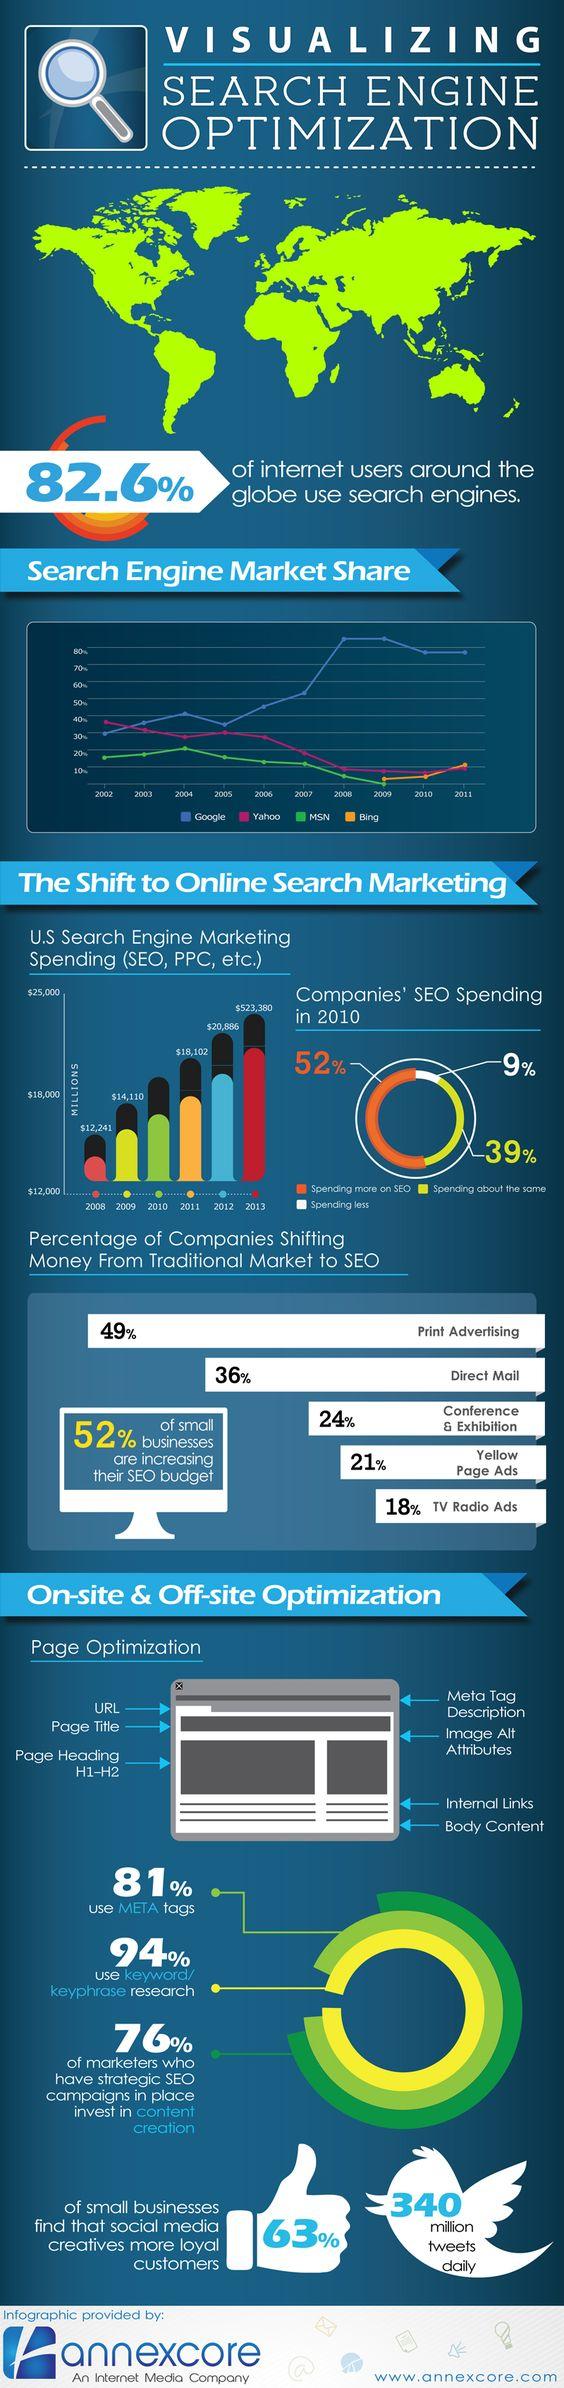 Visualizing SEO (Search Engine Optimization)